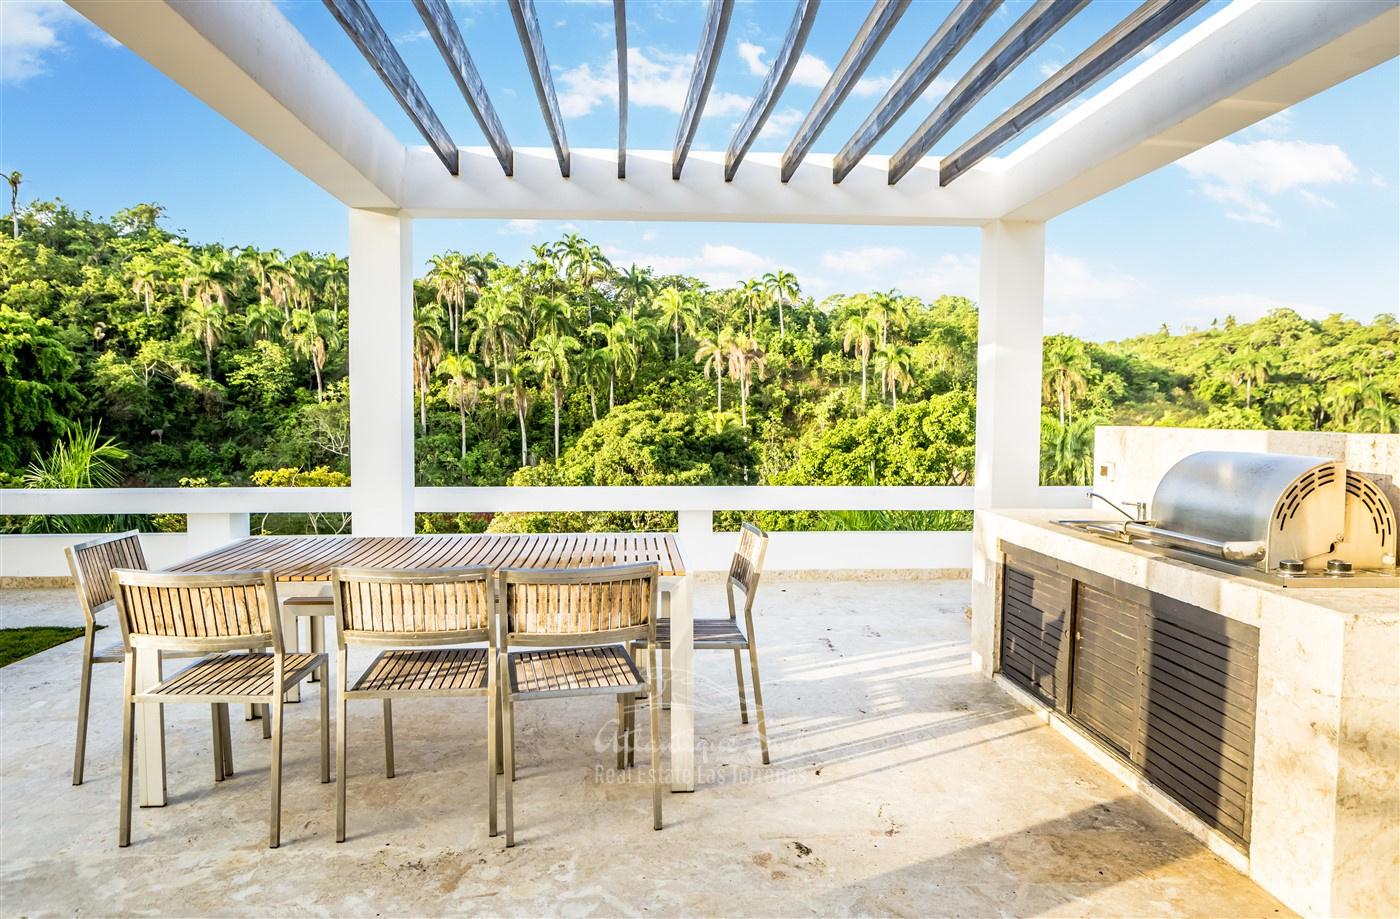 Modern Villa on a hill with ocean views Real Estate Las Terrenas Dominican Republic9.jpg